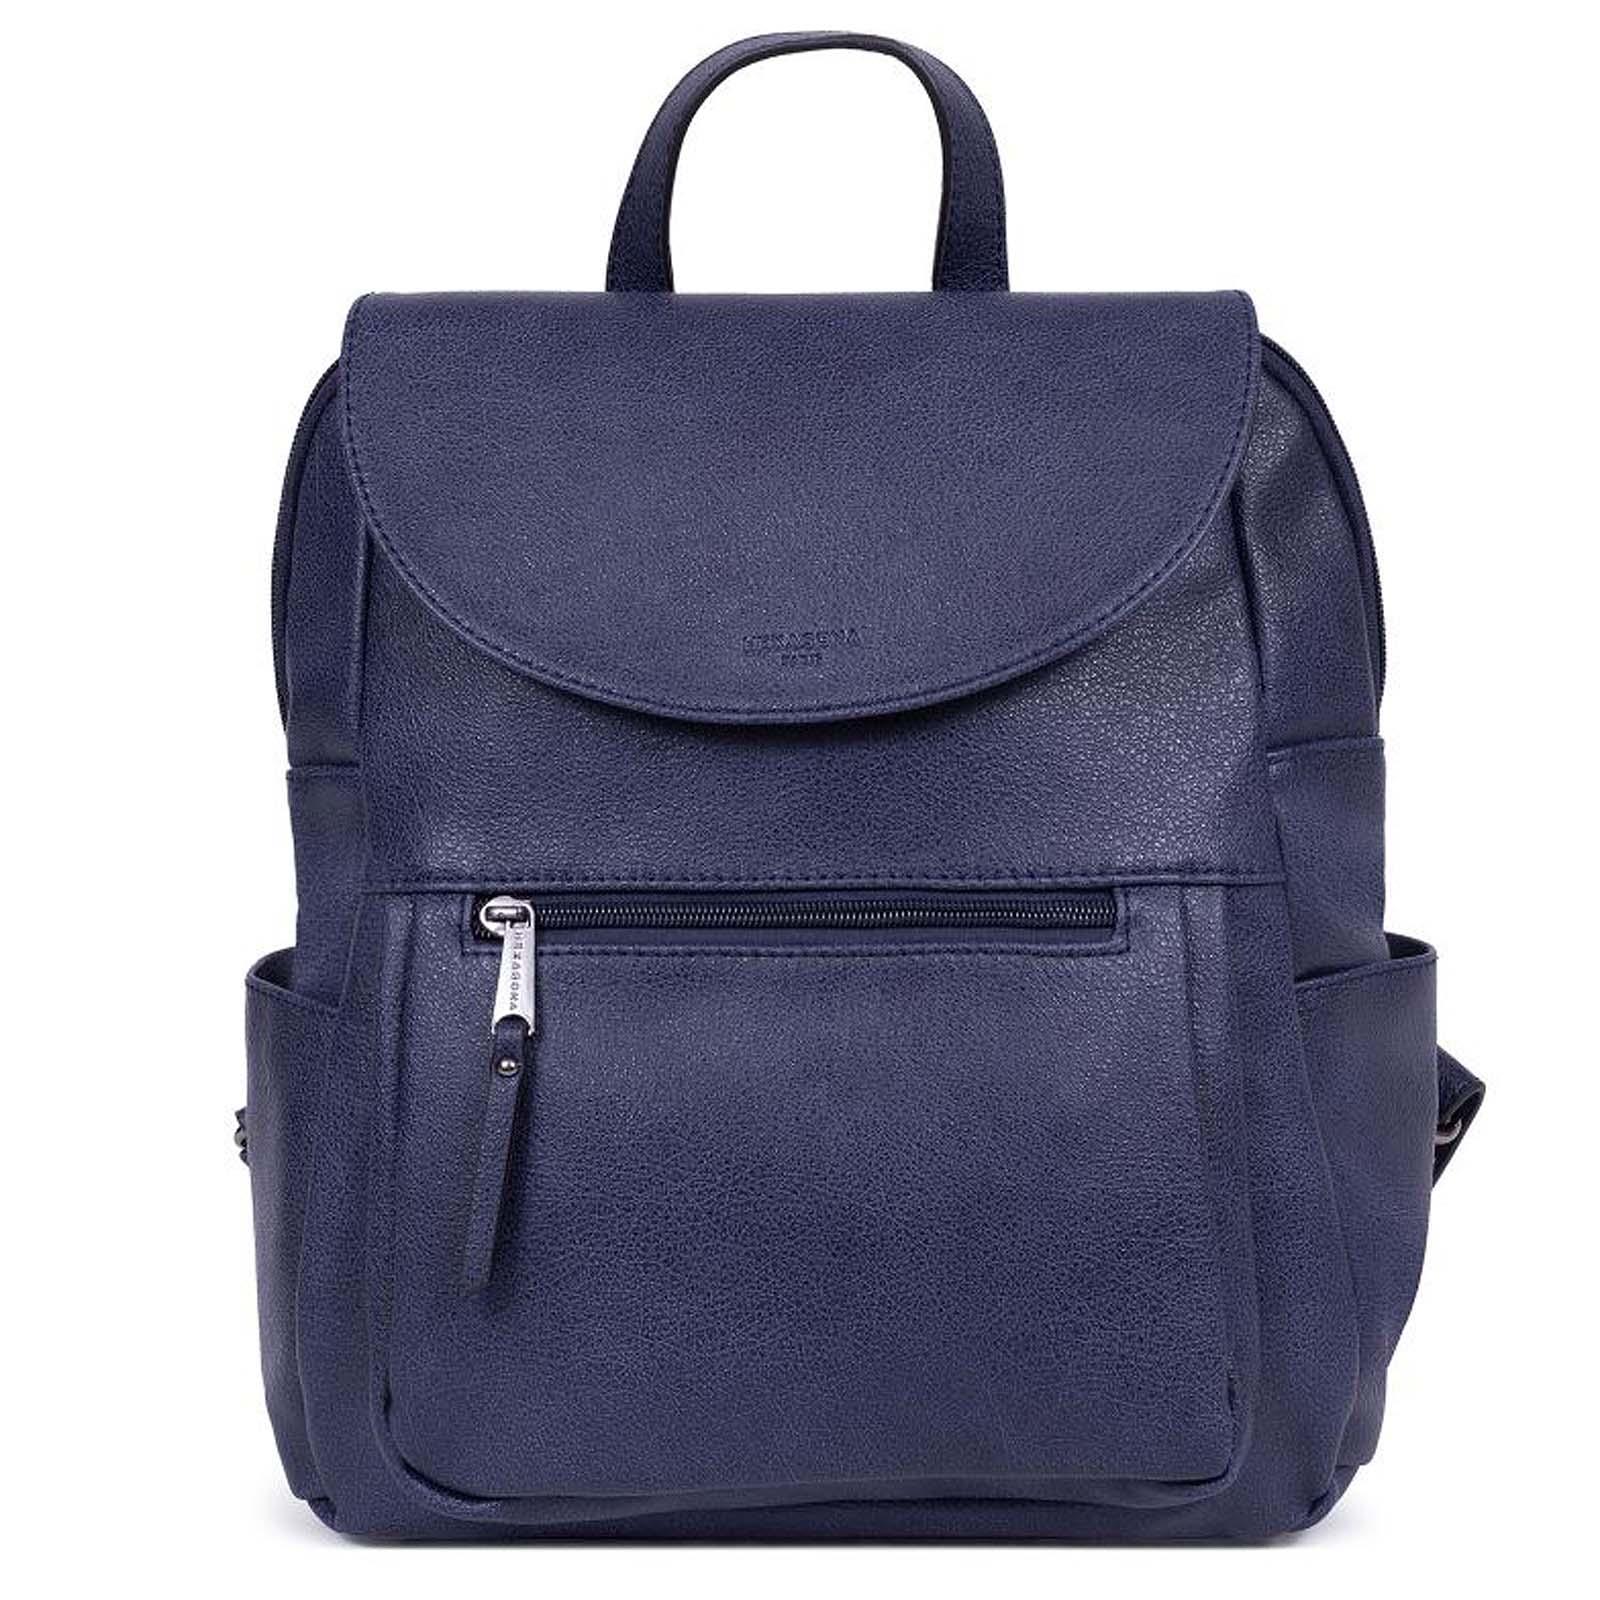 Dámský batoh tmavě modrý - Hexagona Dahoman tmavě modrá